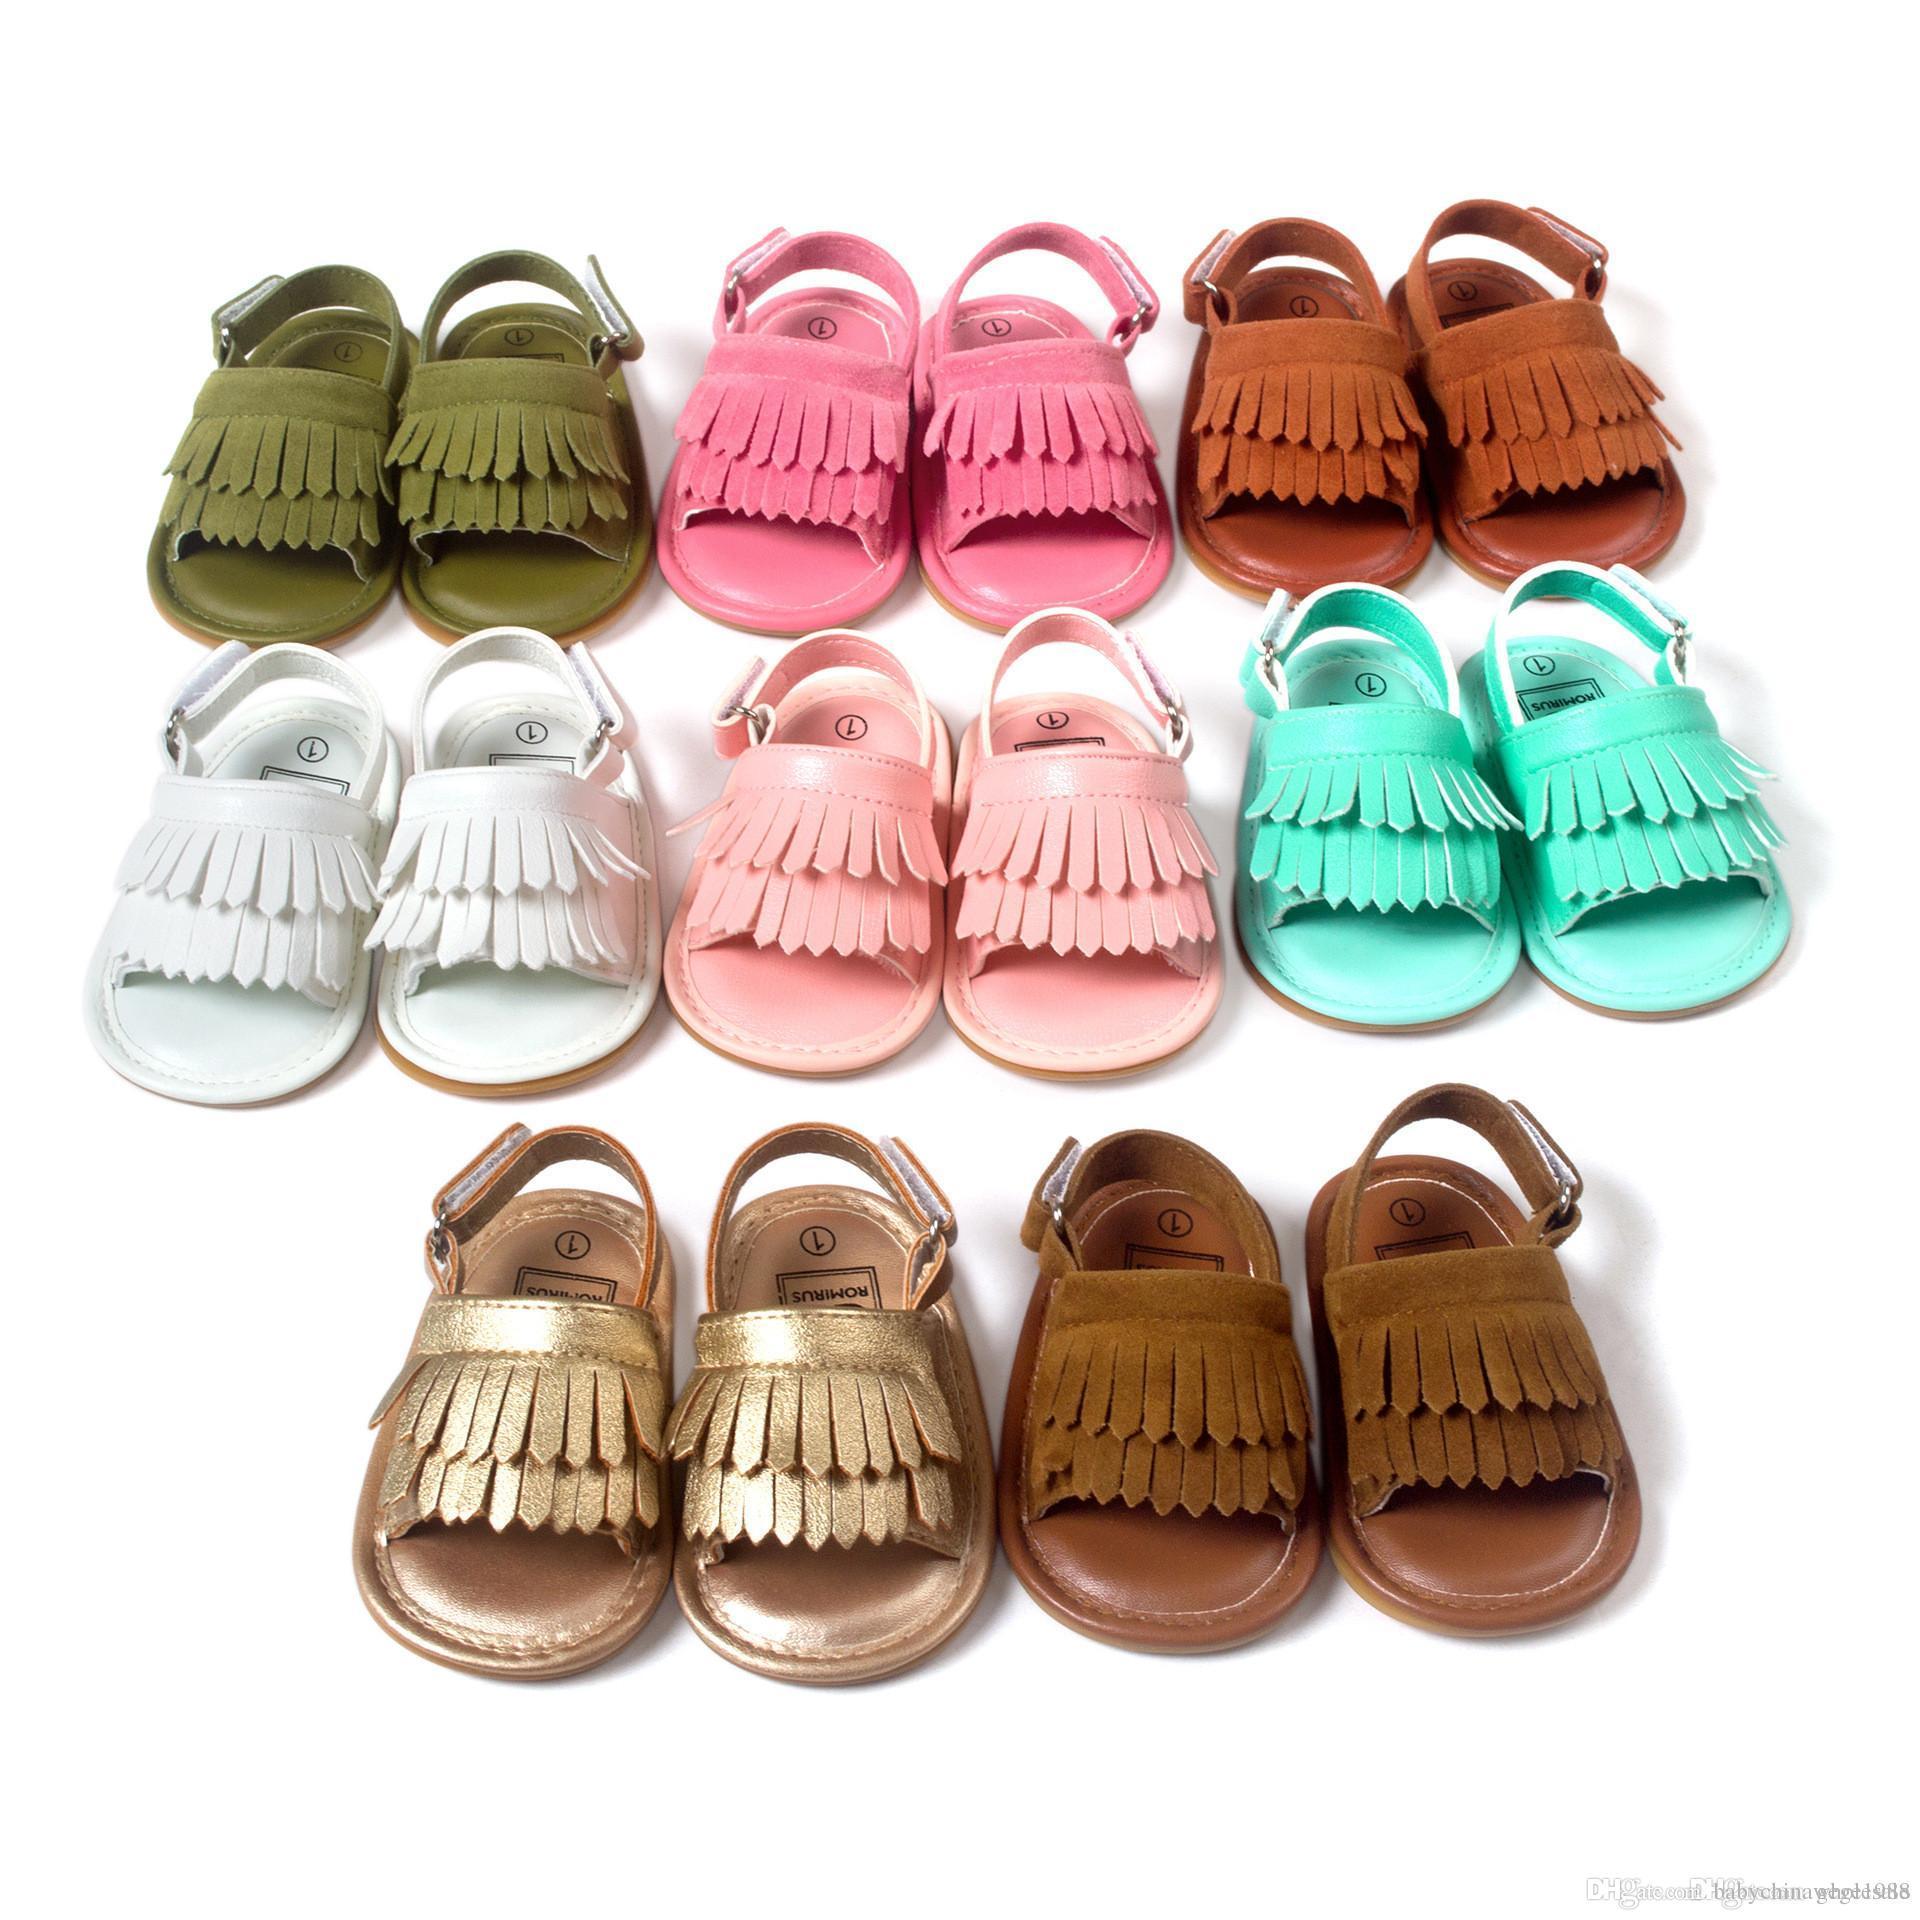 Summer kids moccs new fashion baby kids shoes sandal sho girls boys shoes children sandals BX164